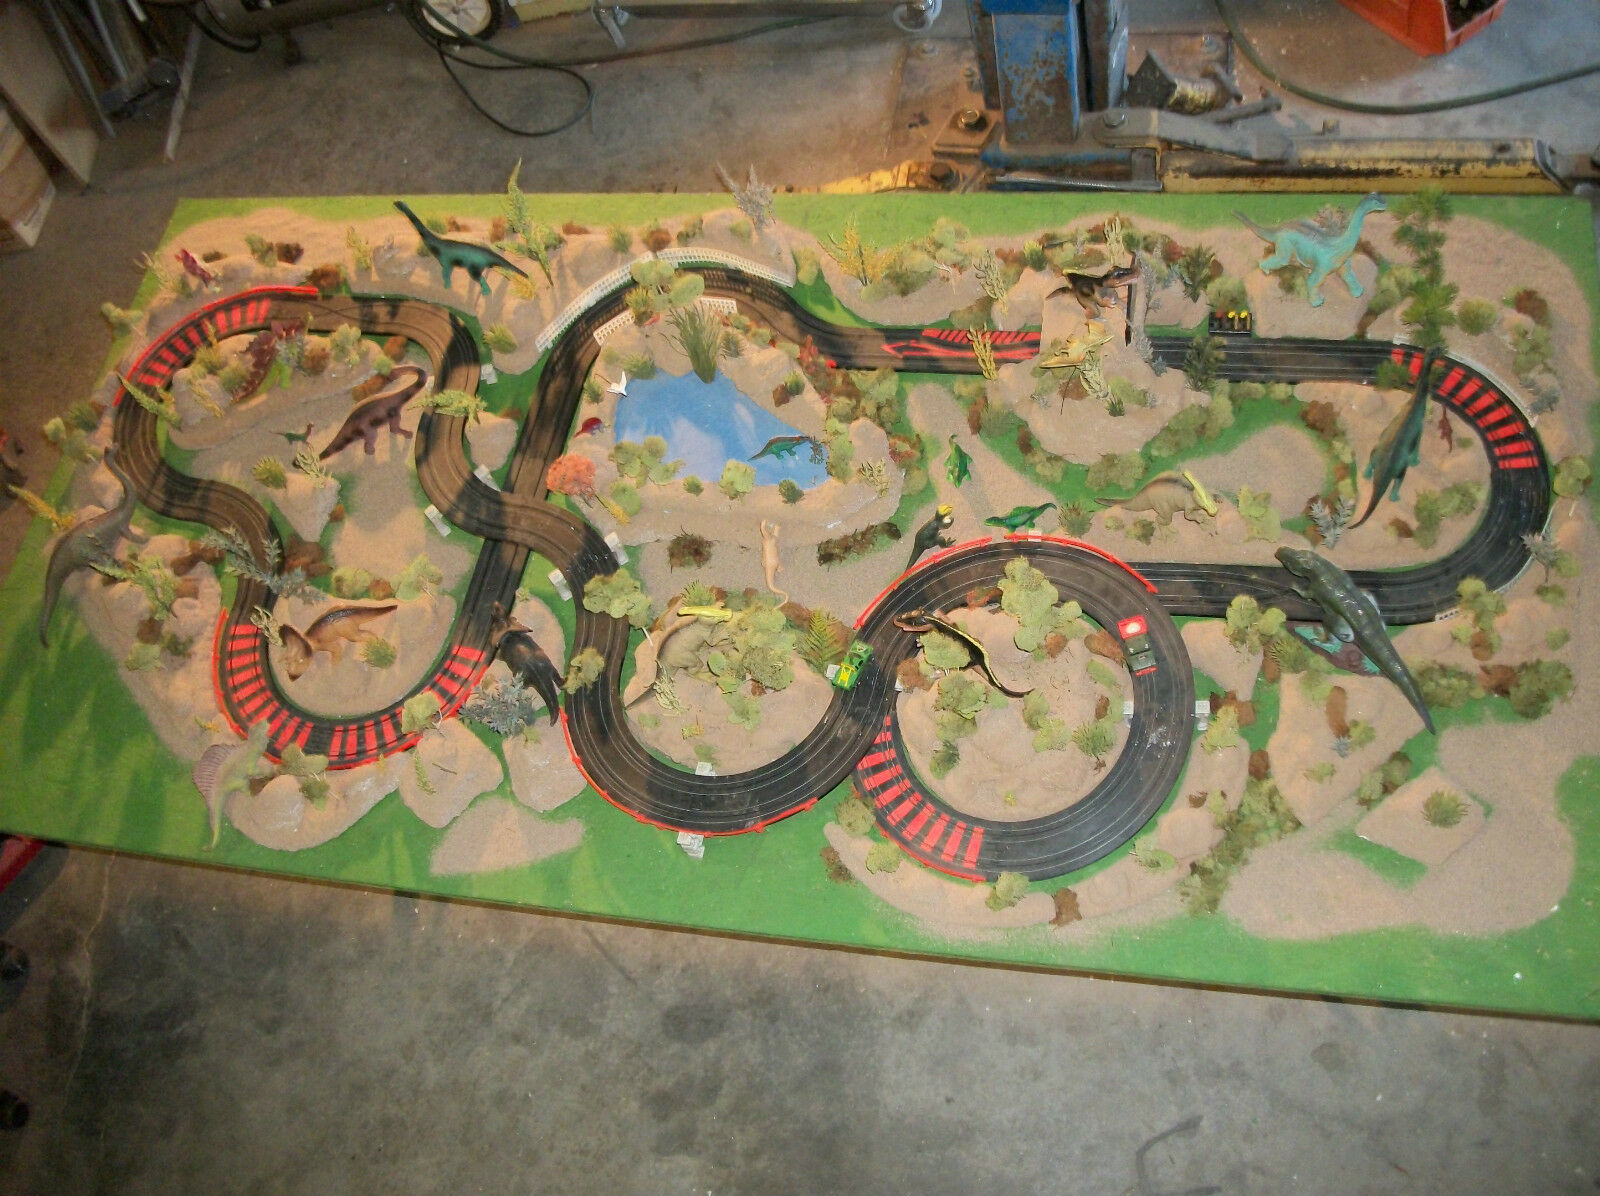 Jurassic park - auto - layout